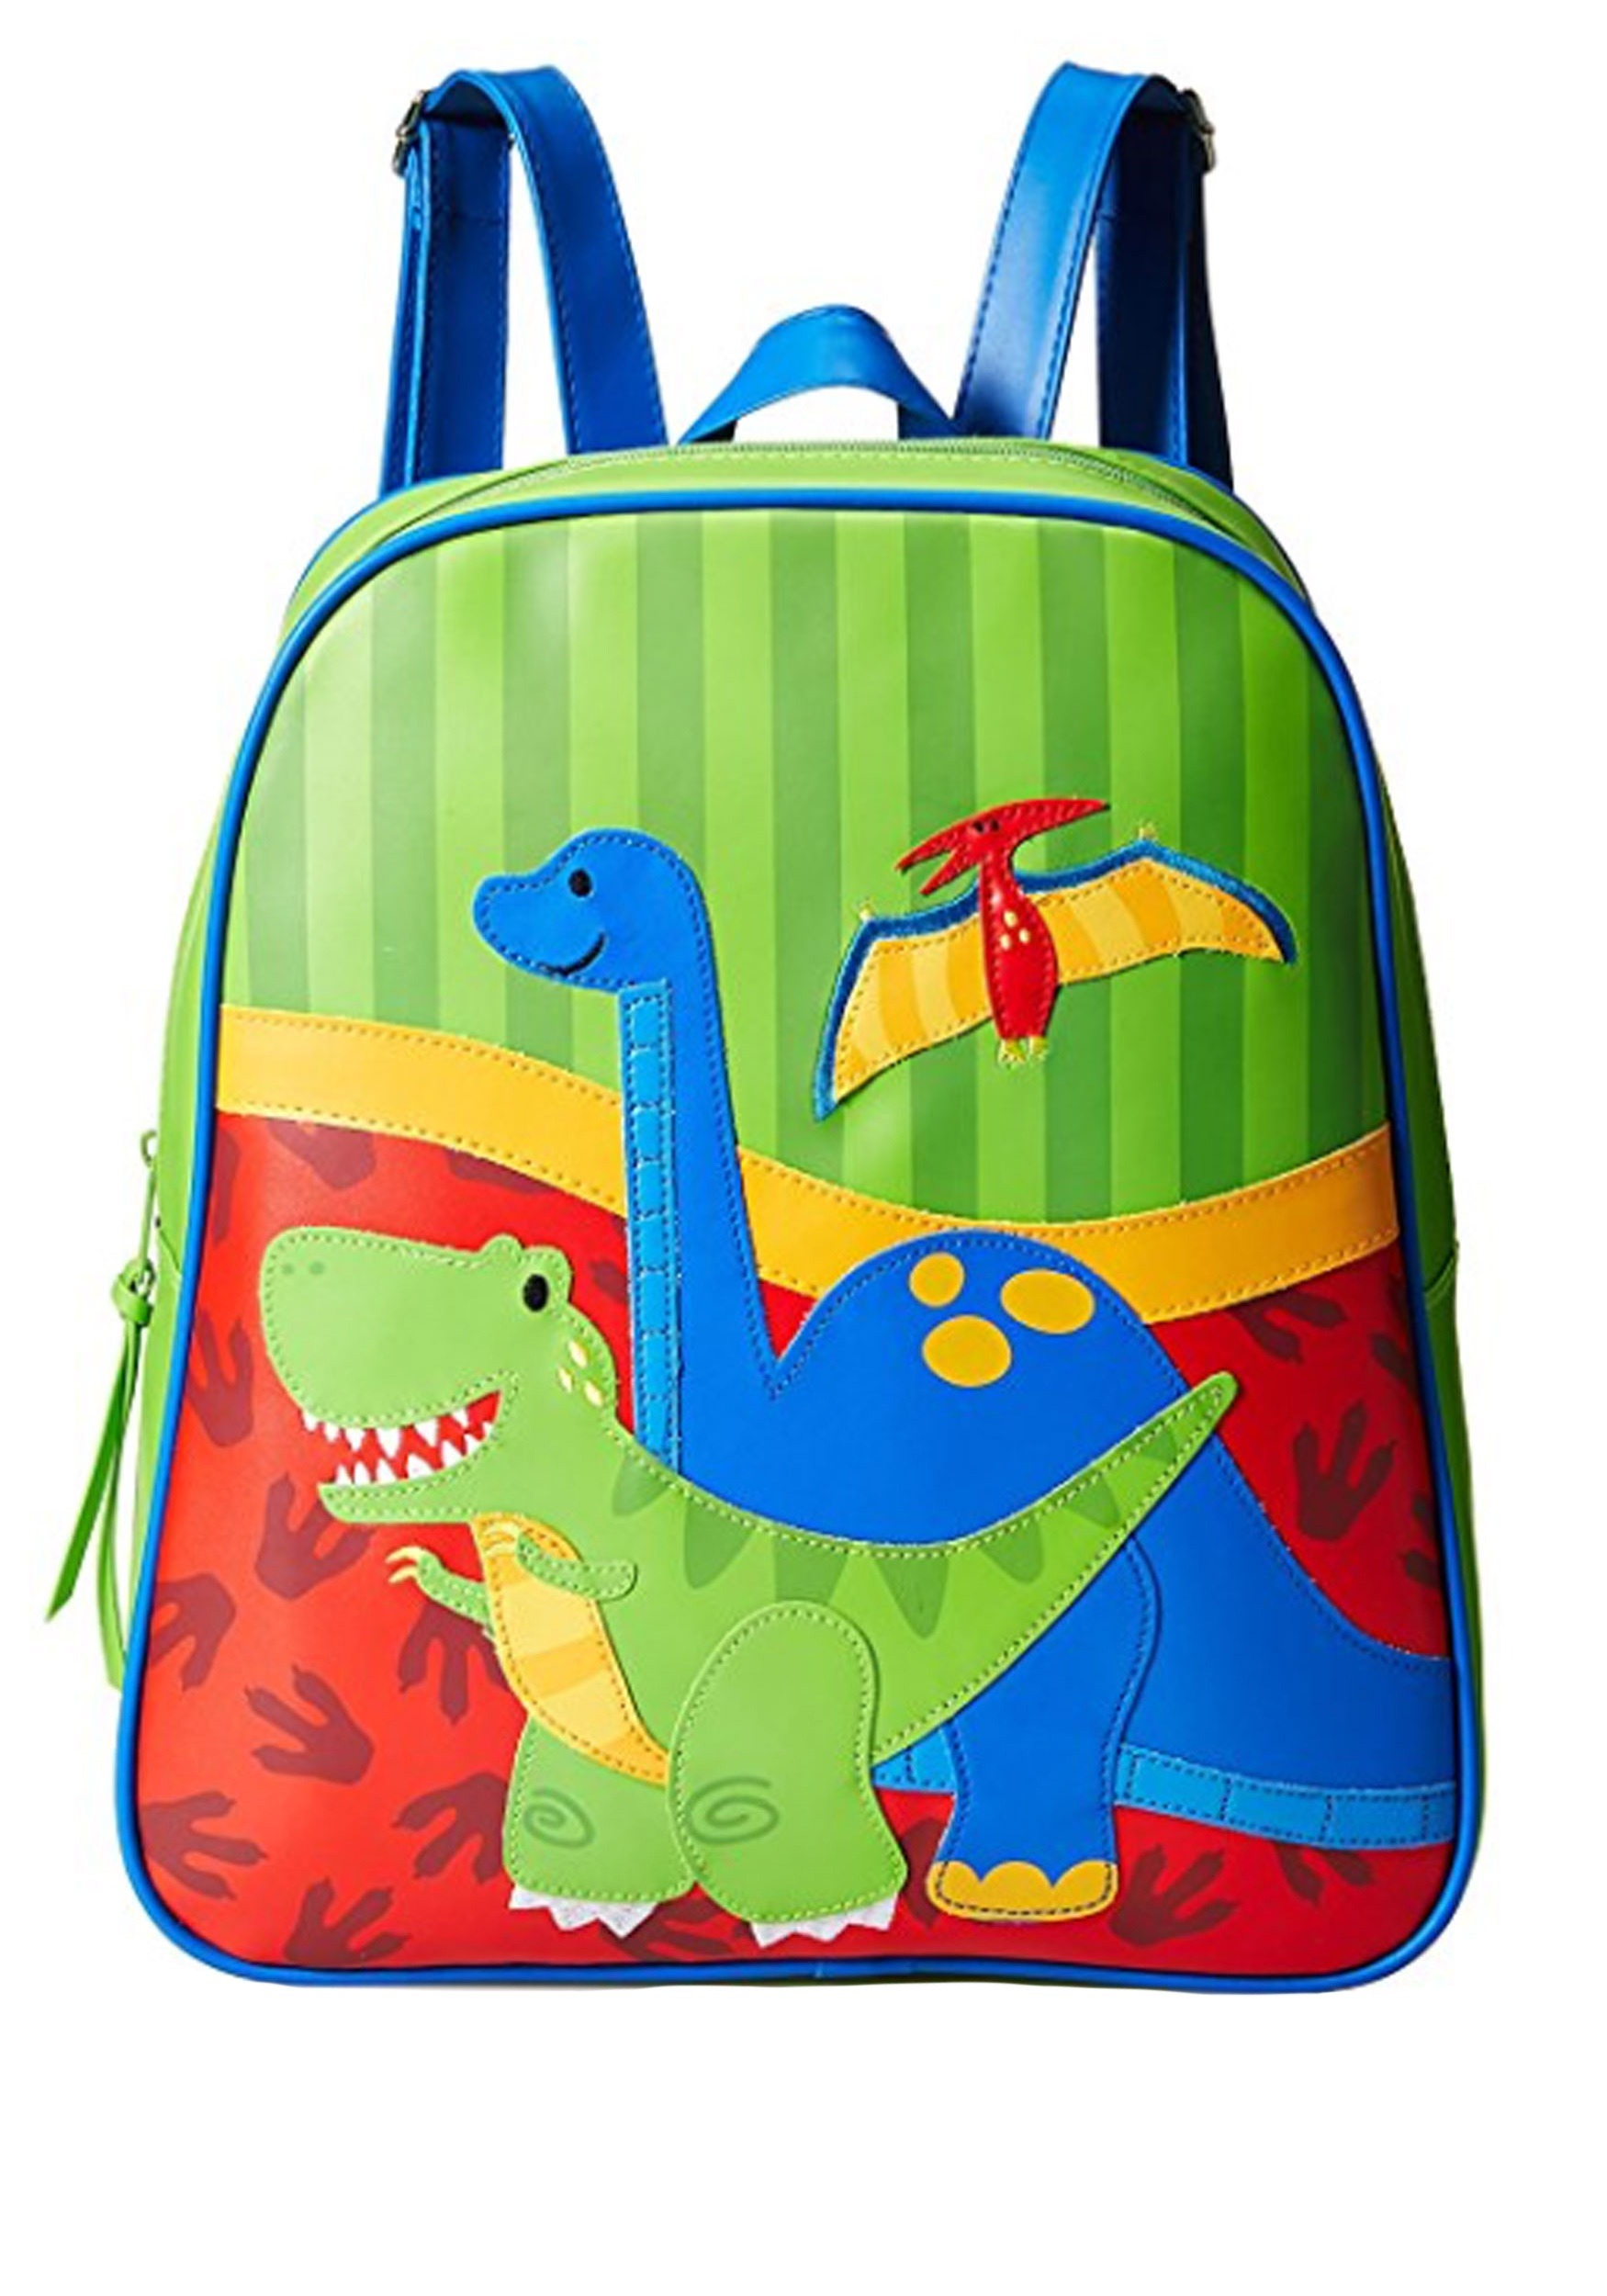 Go-Go Stephen Joseph Dinosaur Bag